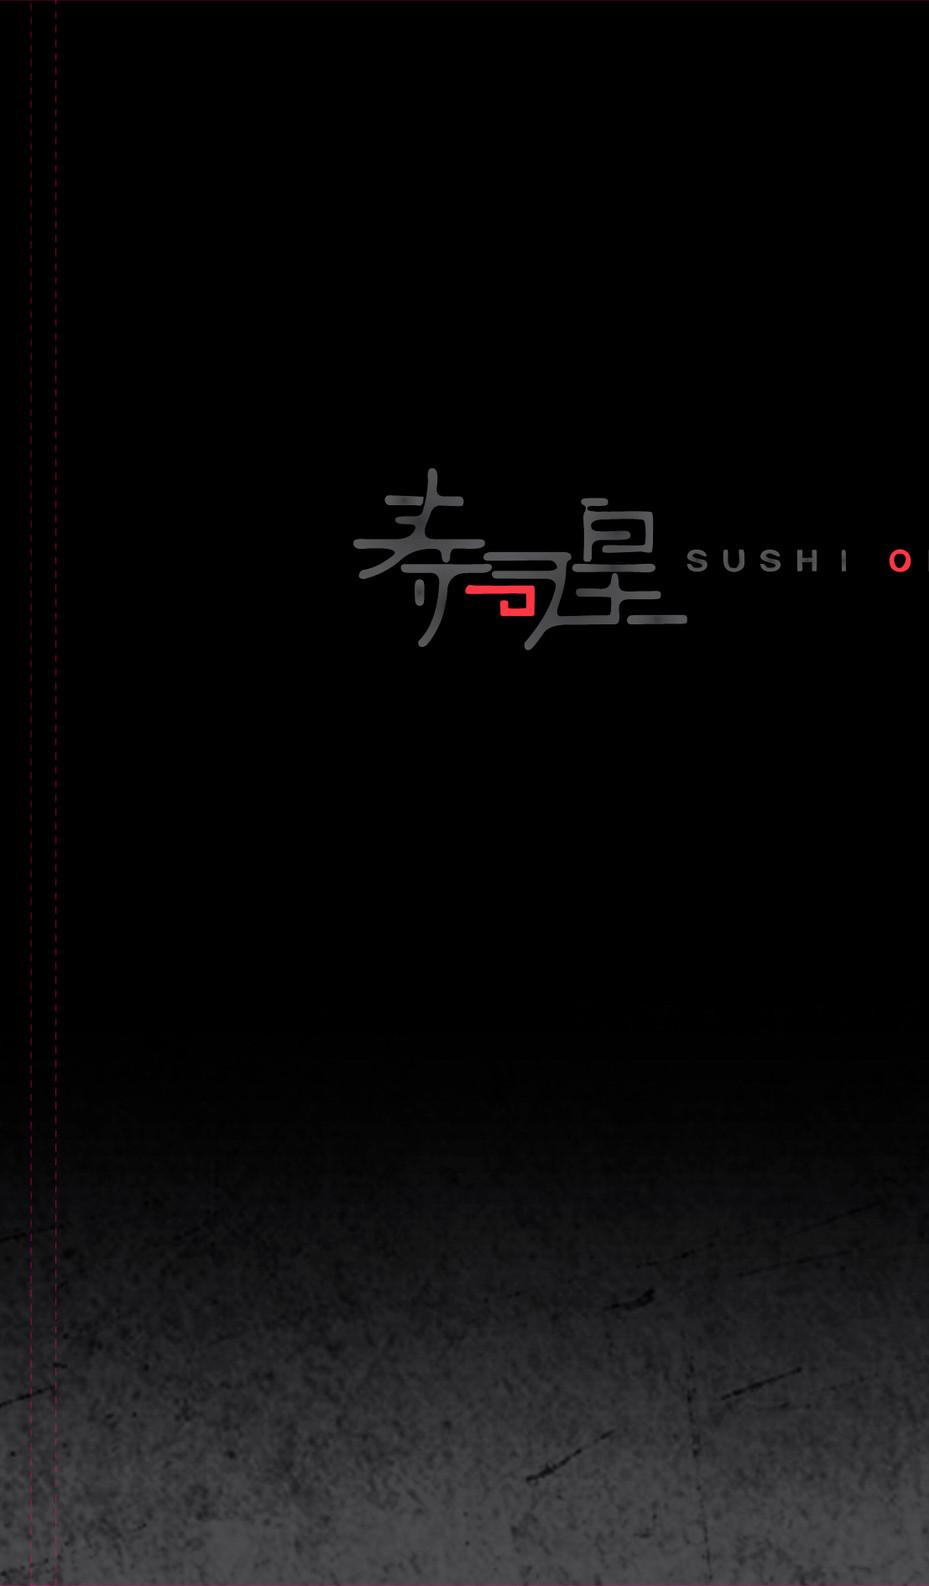 SushiOh_Cover.jpg